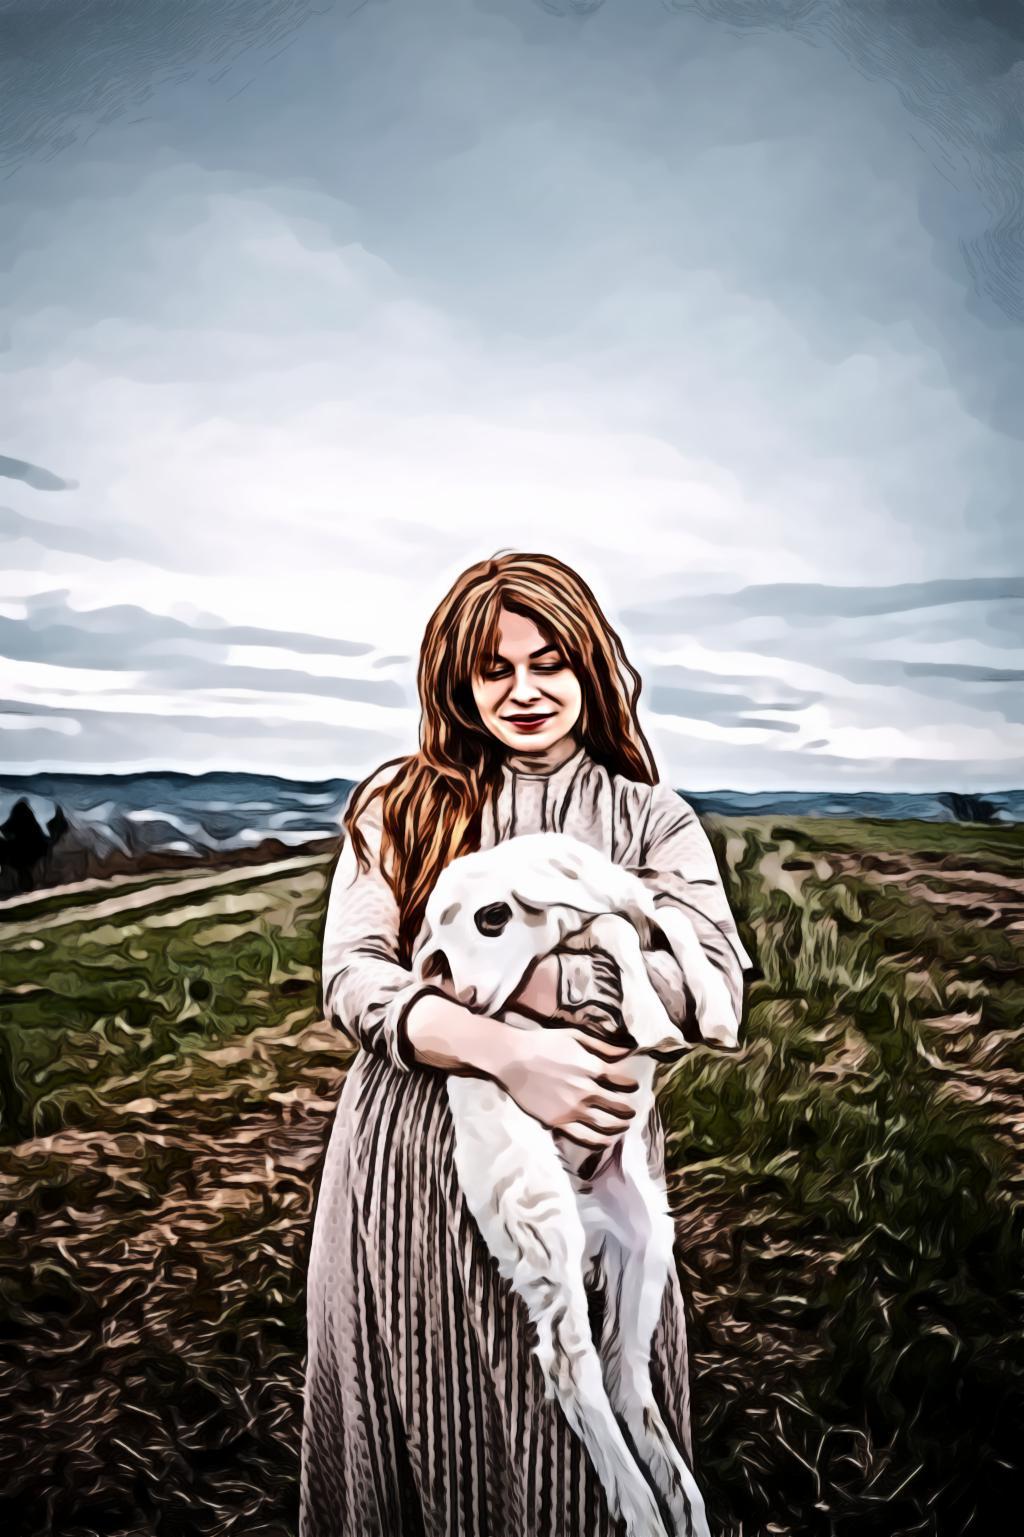 Woman carrying a lamb